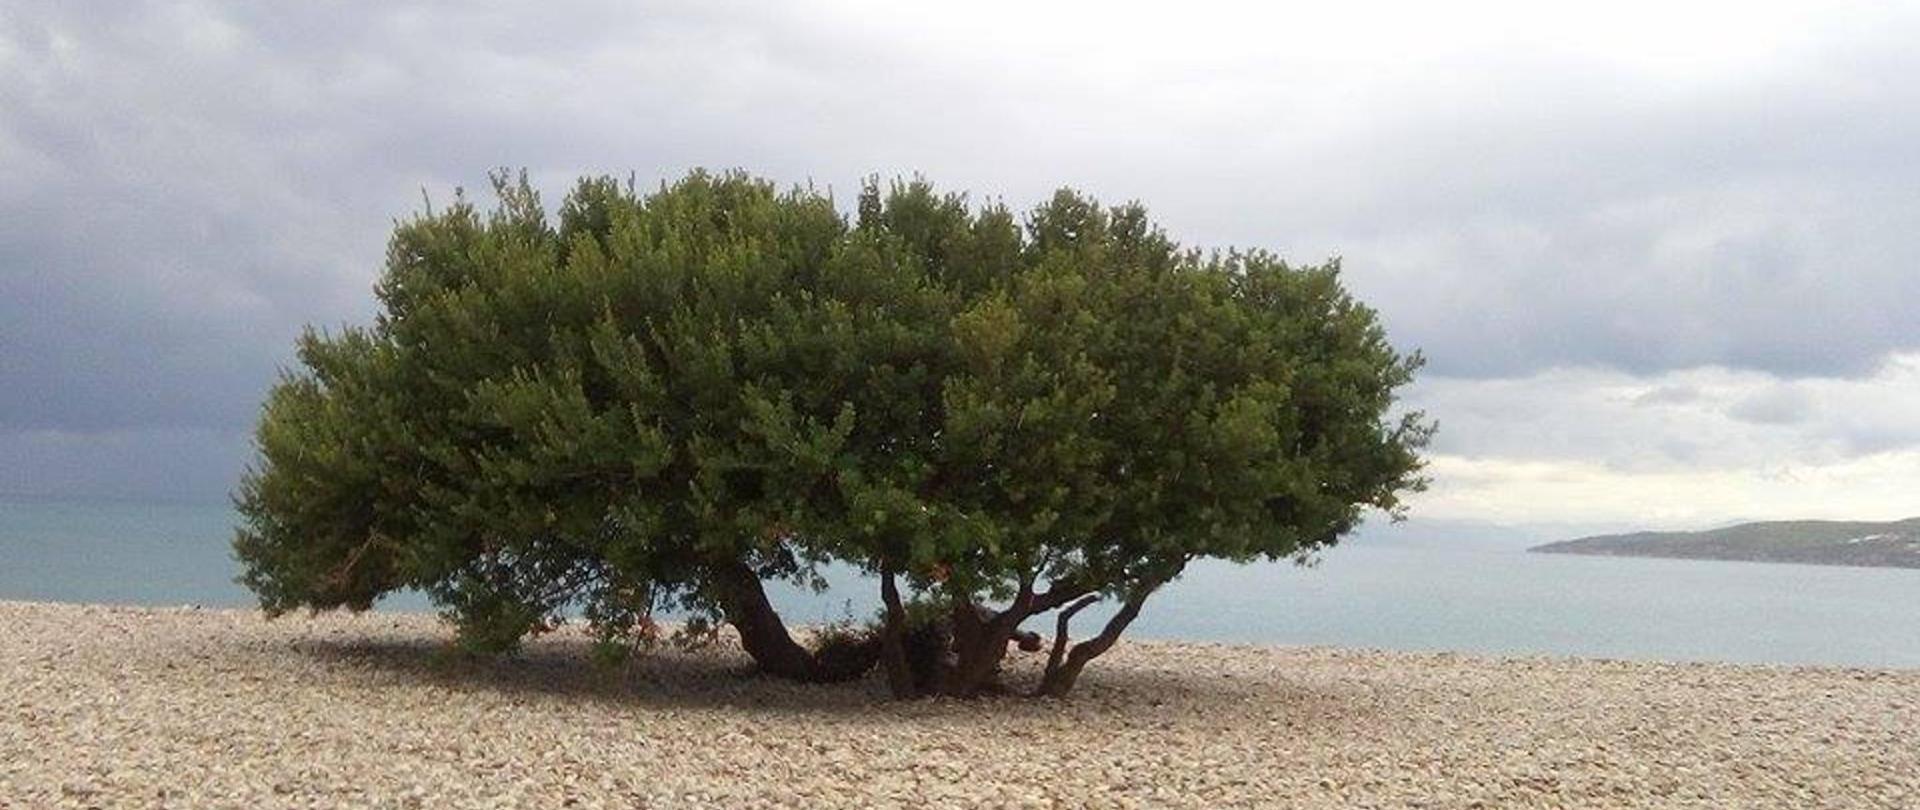 Ververouda beach